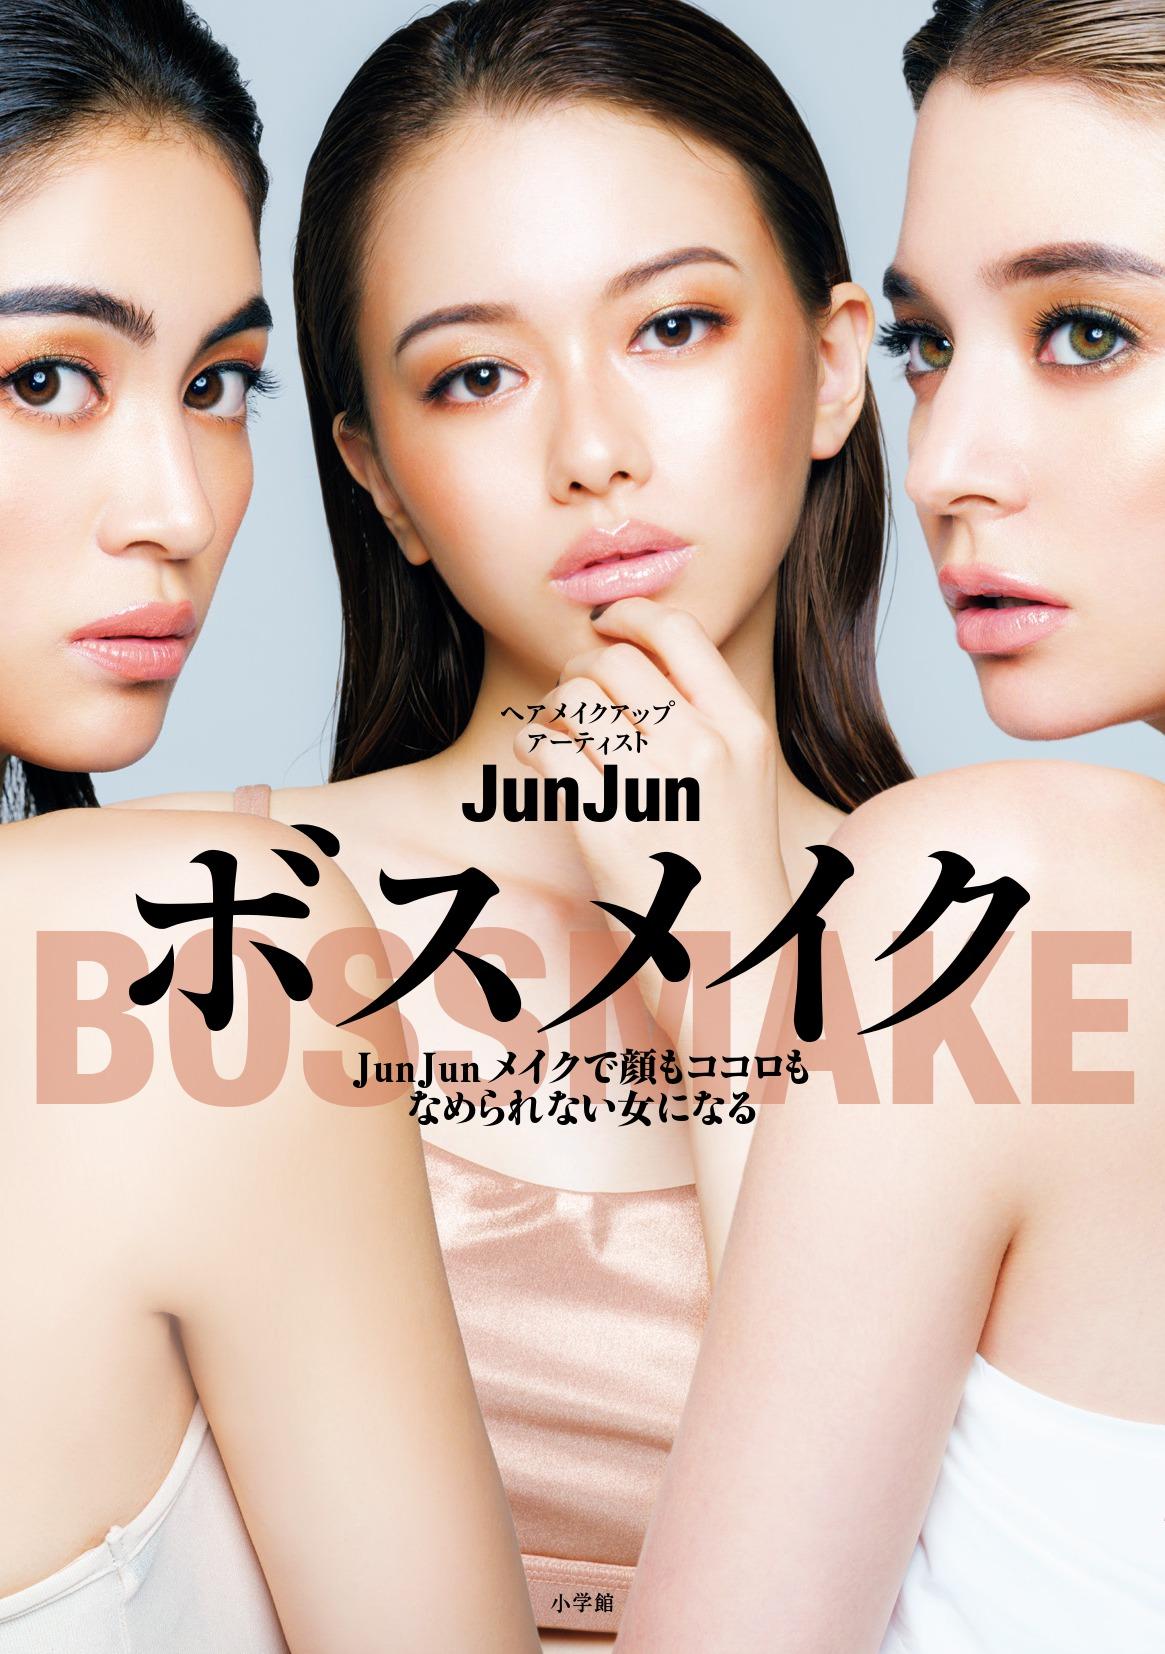 JunJun BOSSMAKE Tour 2019 3月23日(土)東京公演